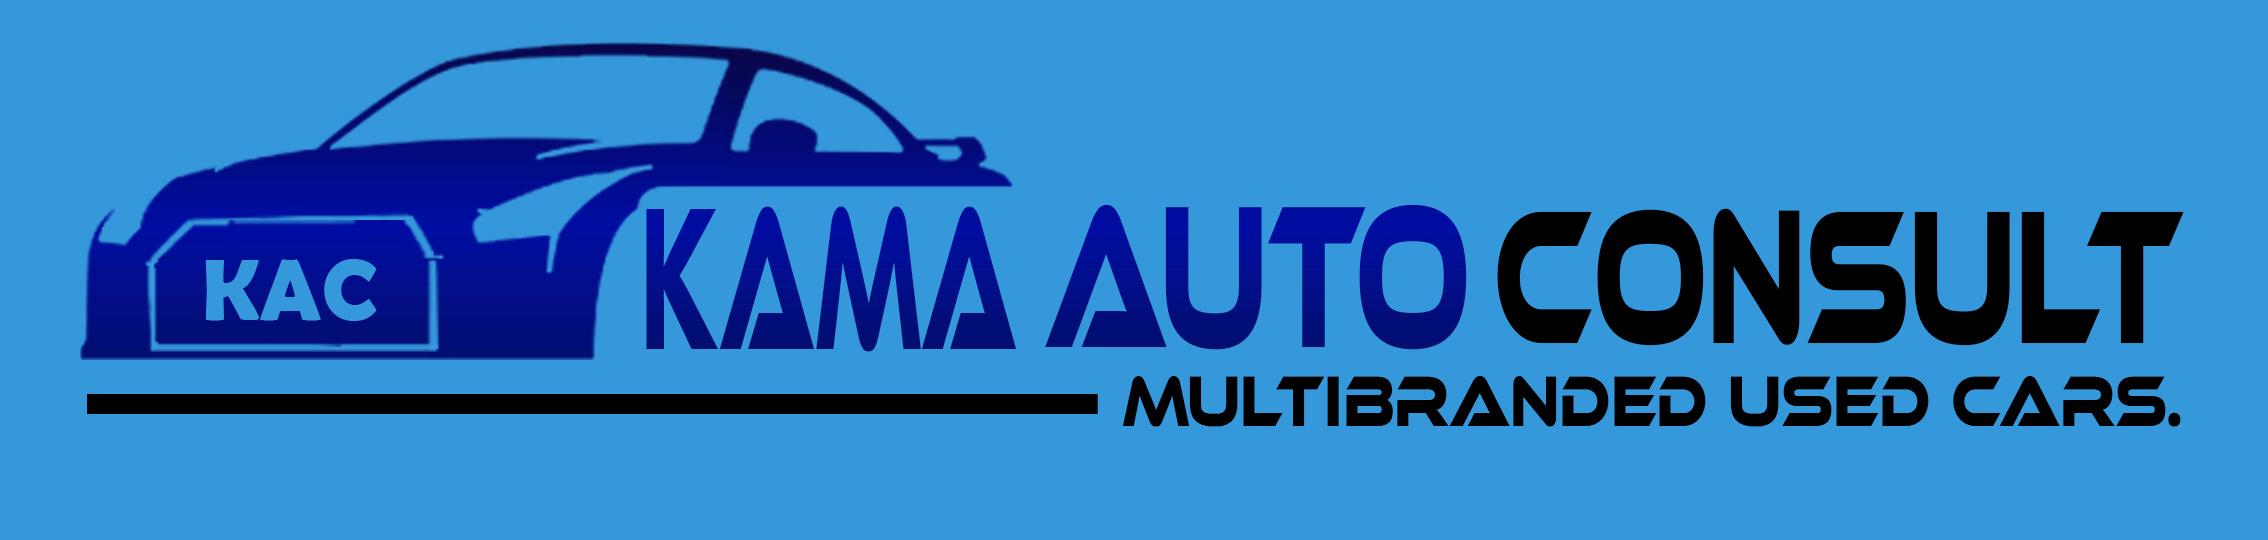 Kama Auto Consult